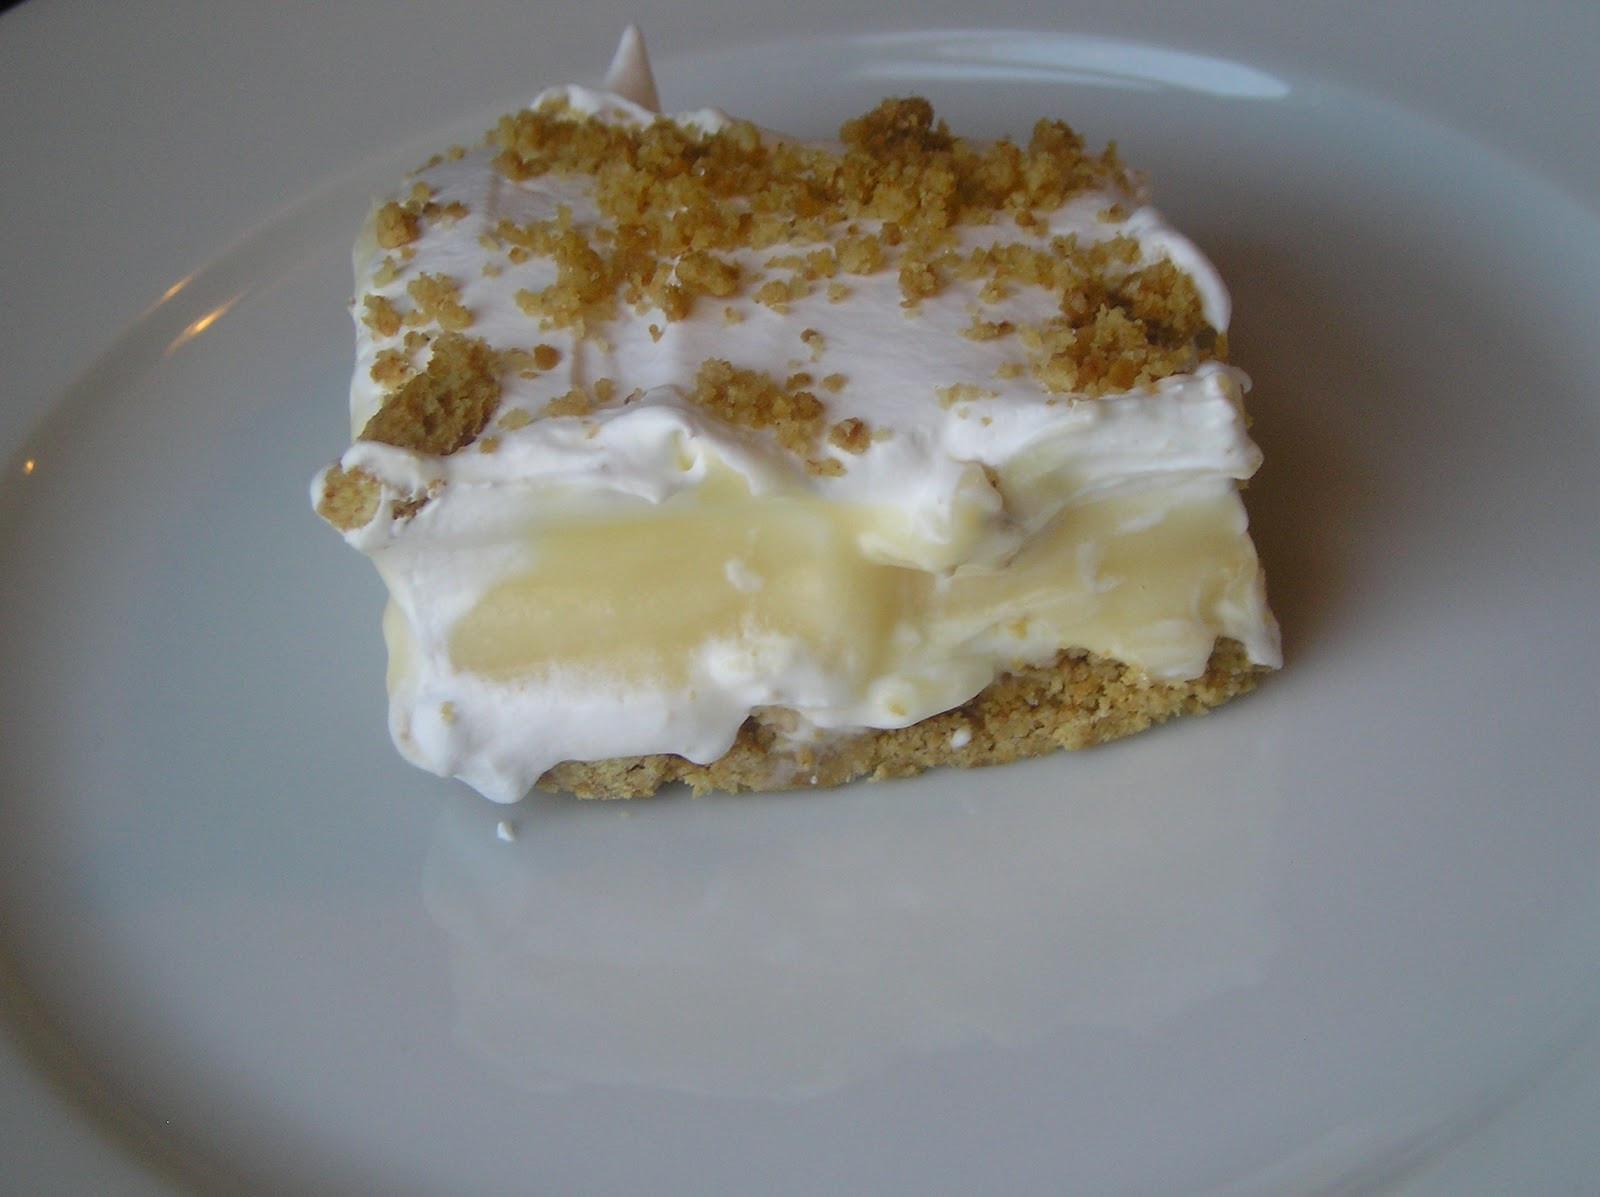 Vanilla Pudding Dessert  Cool and Creamy Layered Pudding Dessert Edesia s Notebook